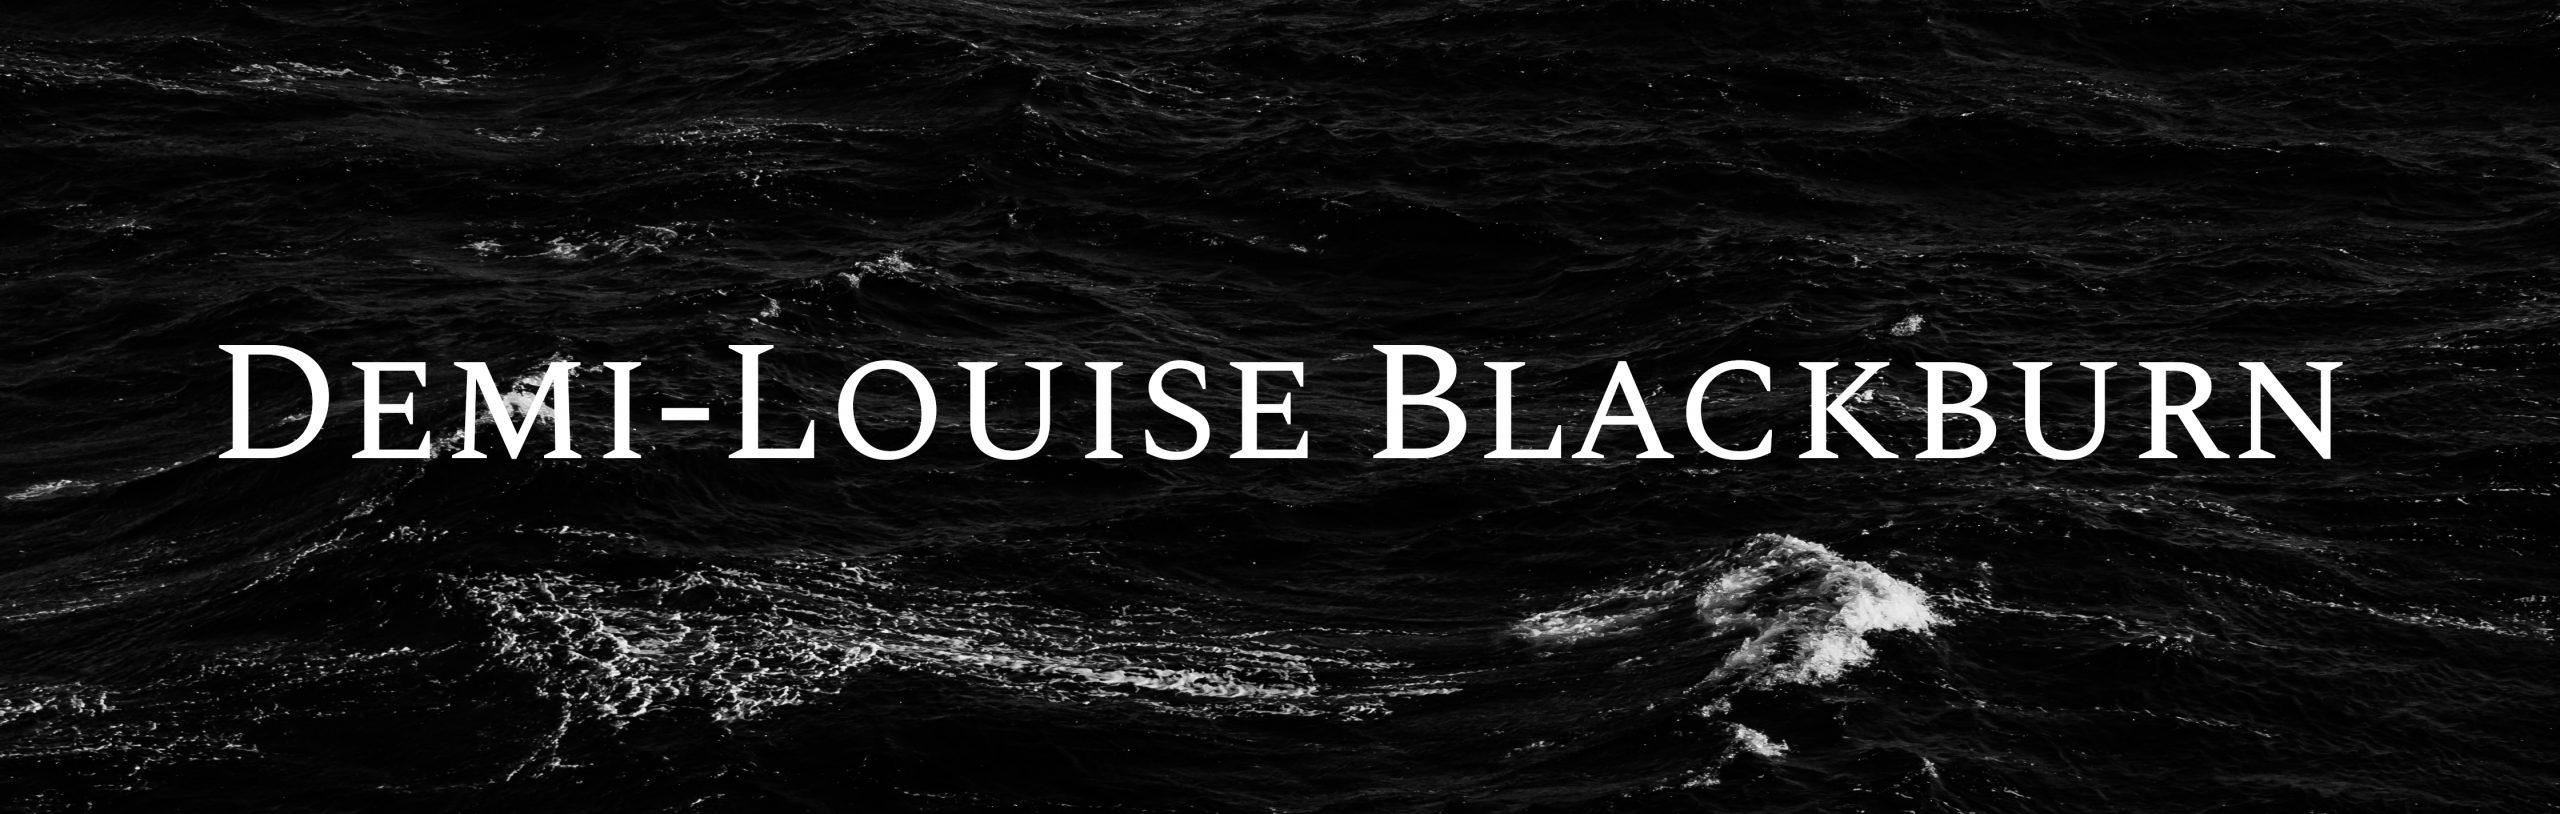 Demi-Louise Blackburn